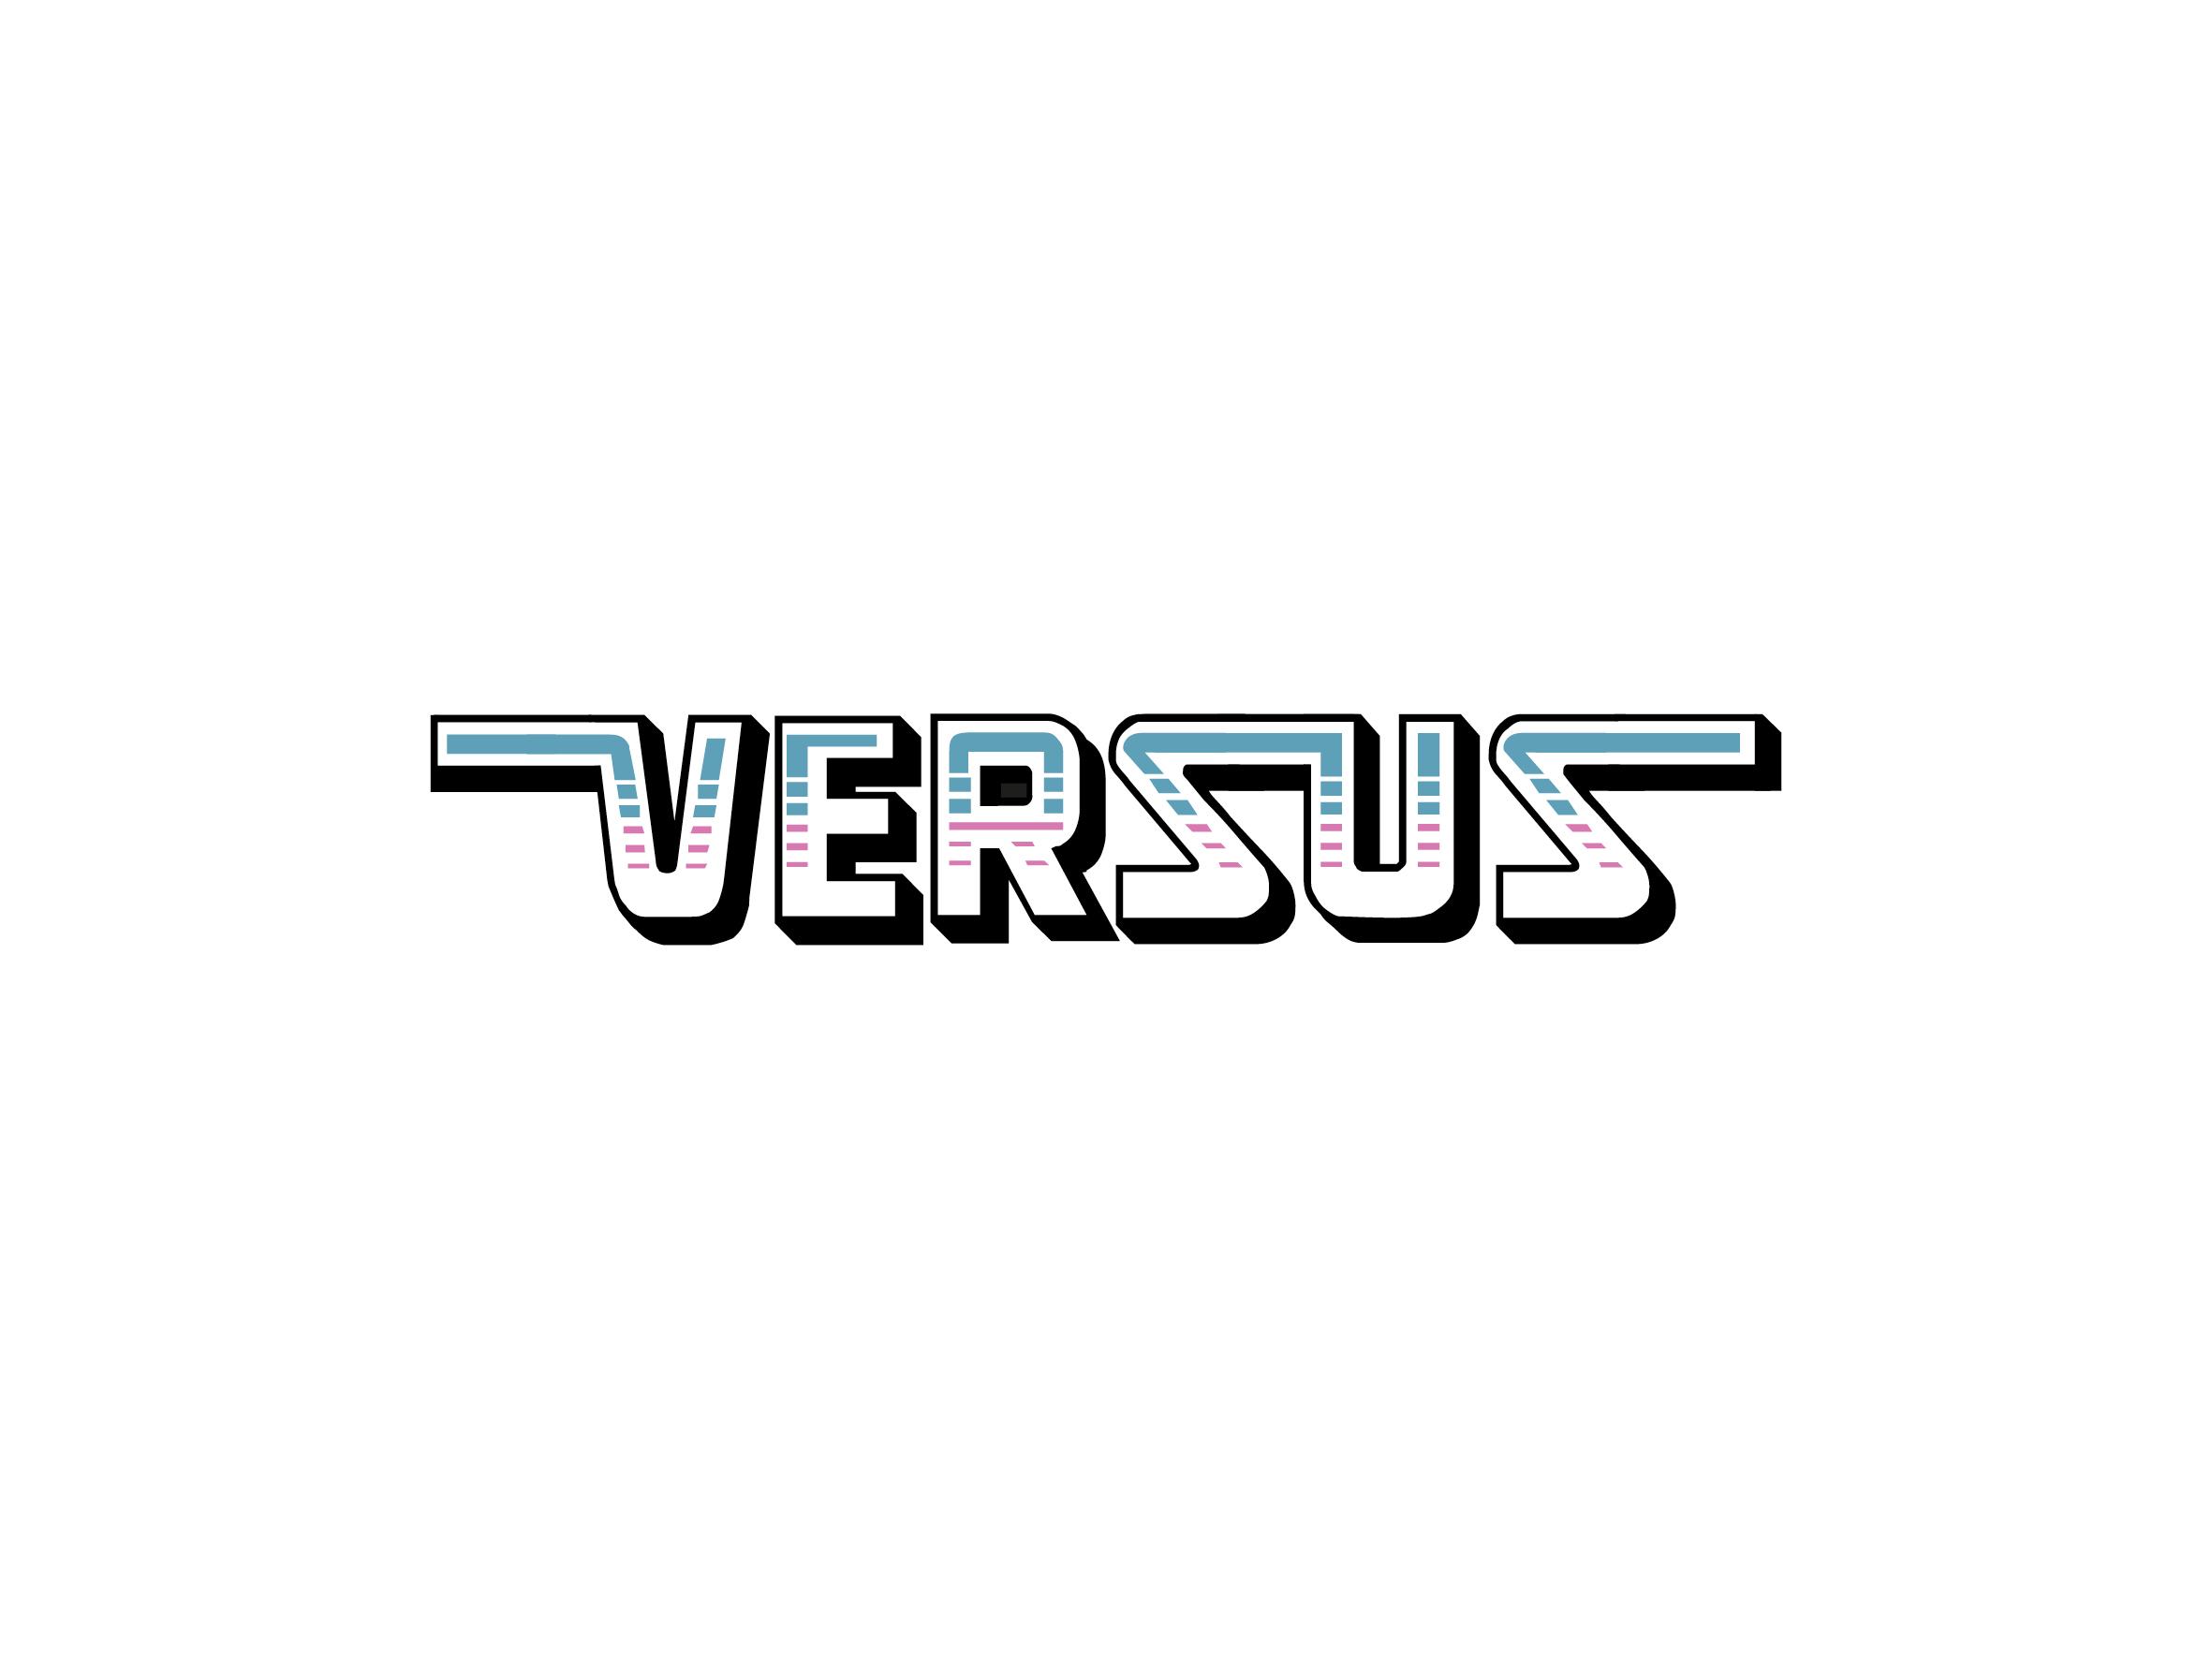 versus night logo design designed by Dakini Design Saltaire, Shipley, Bradford